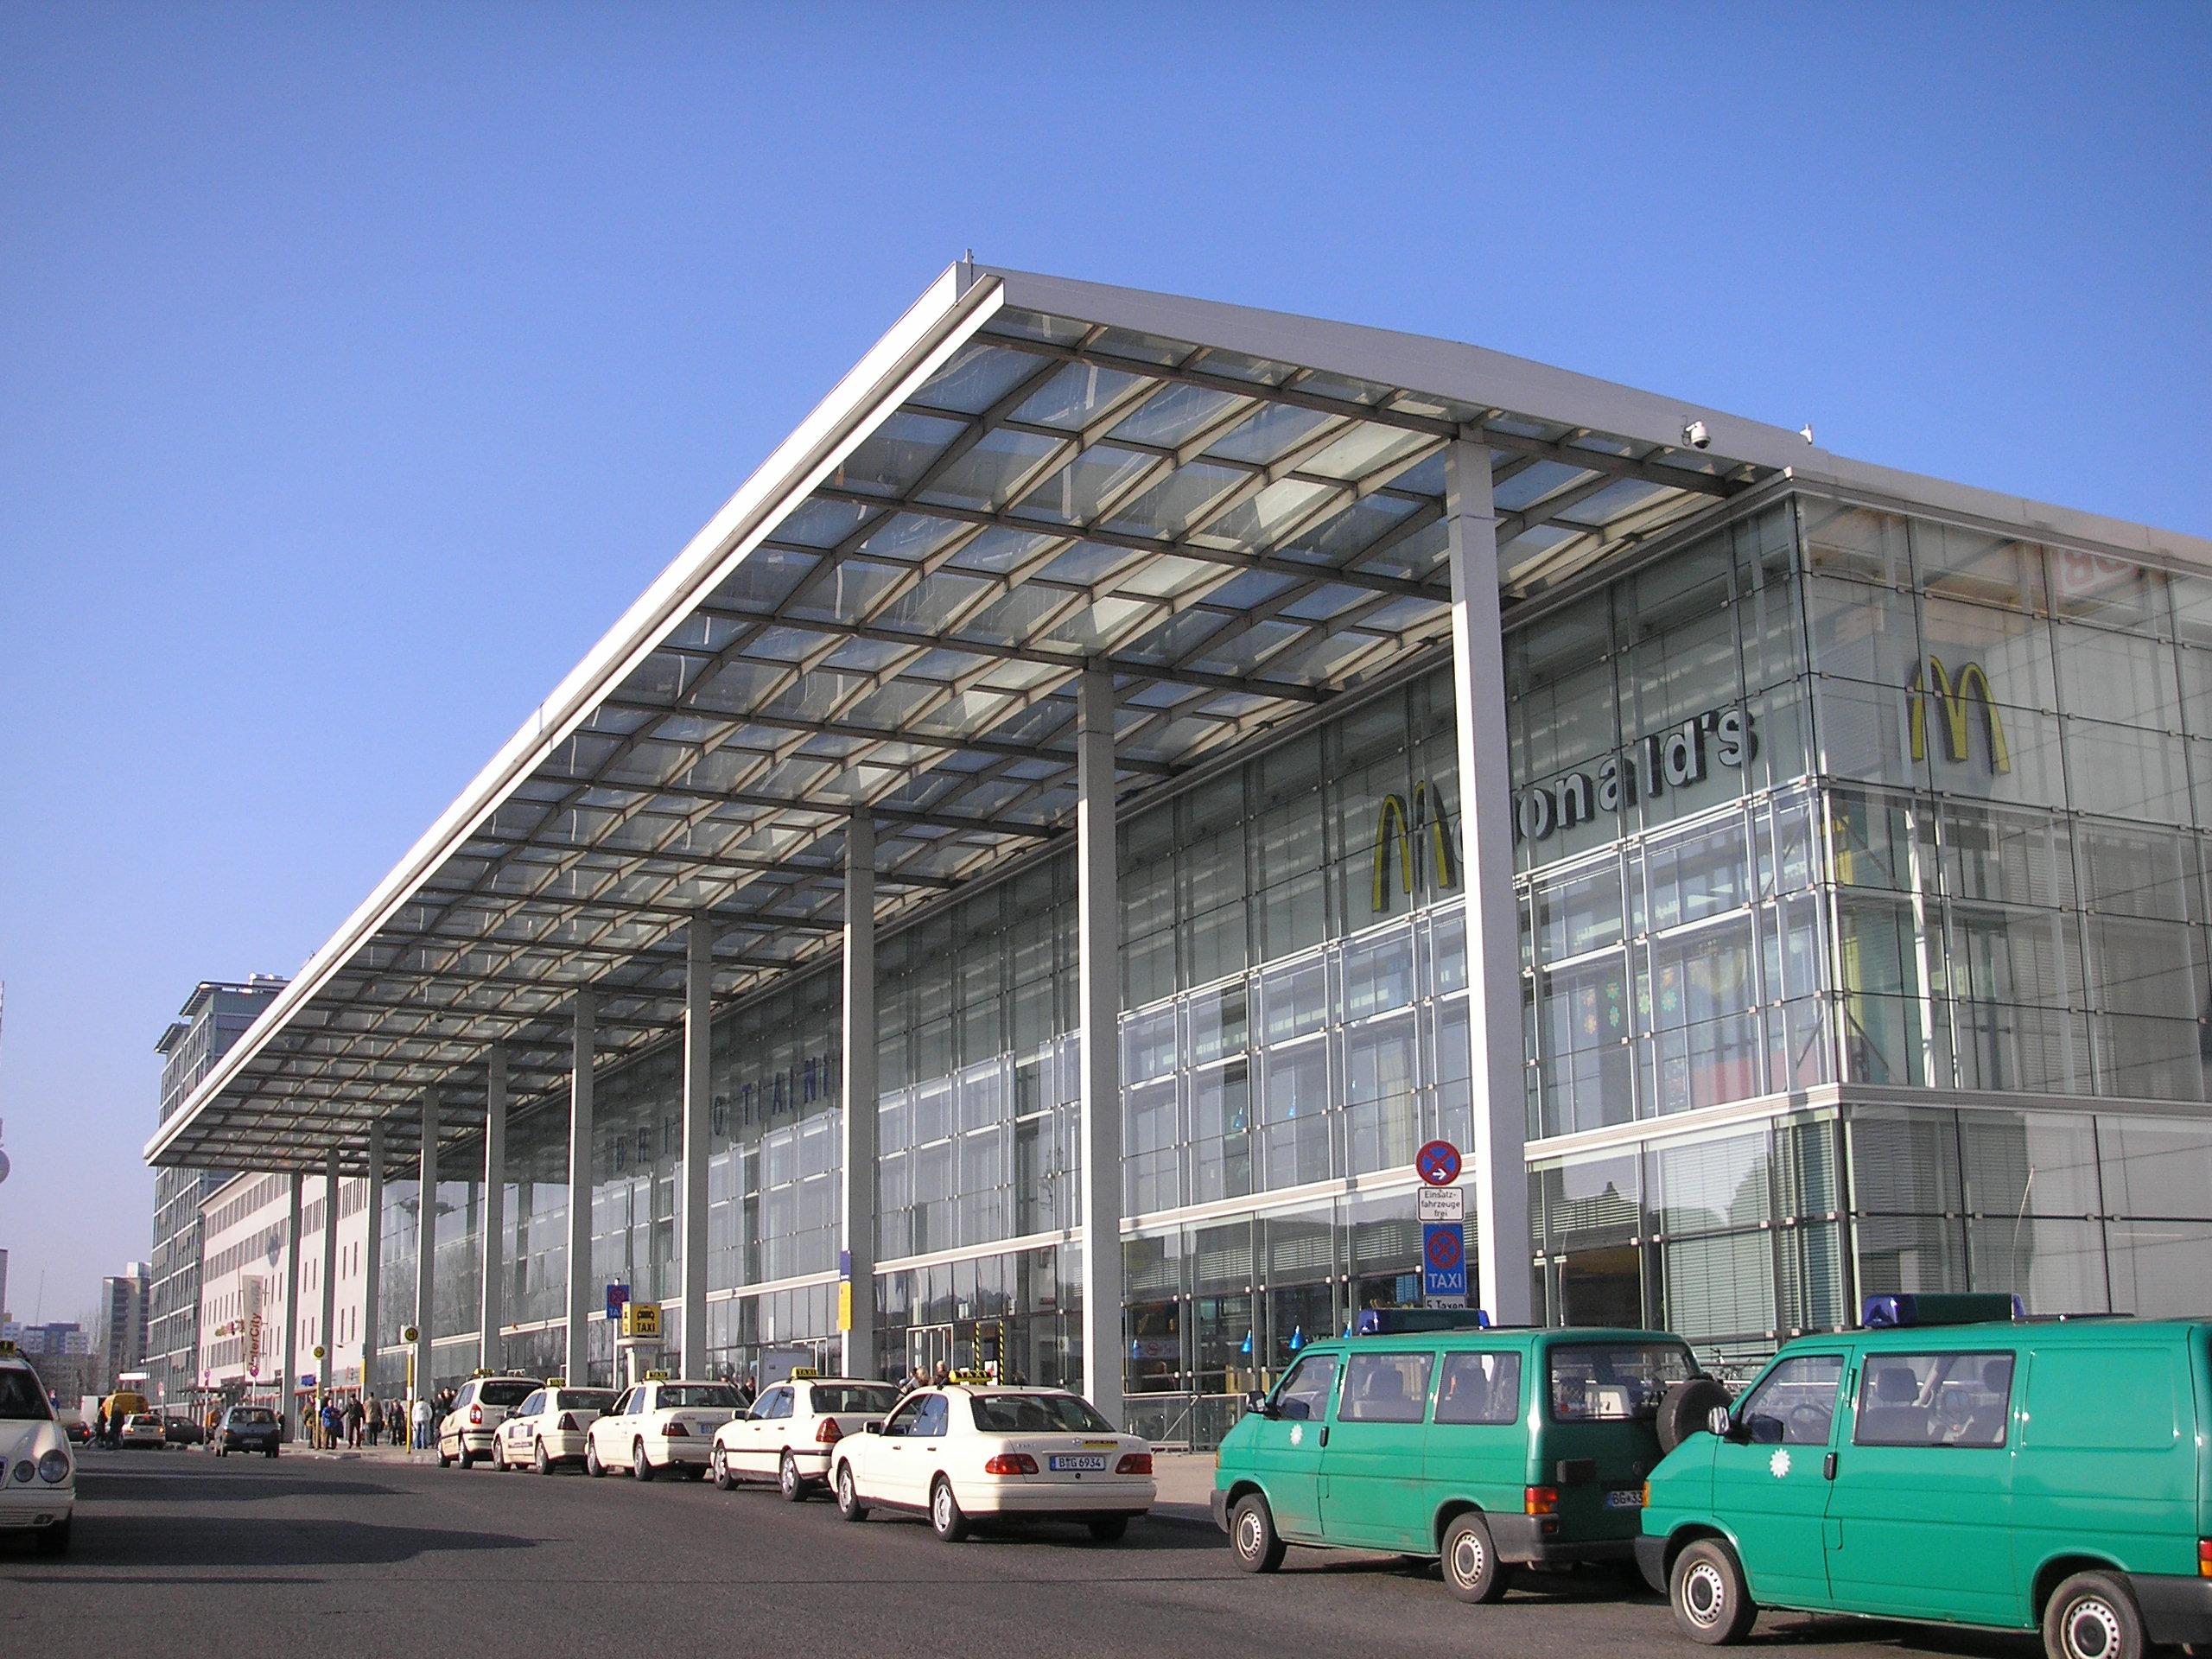 db casino berlin ostbahnhof